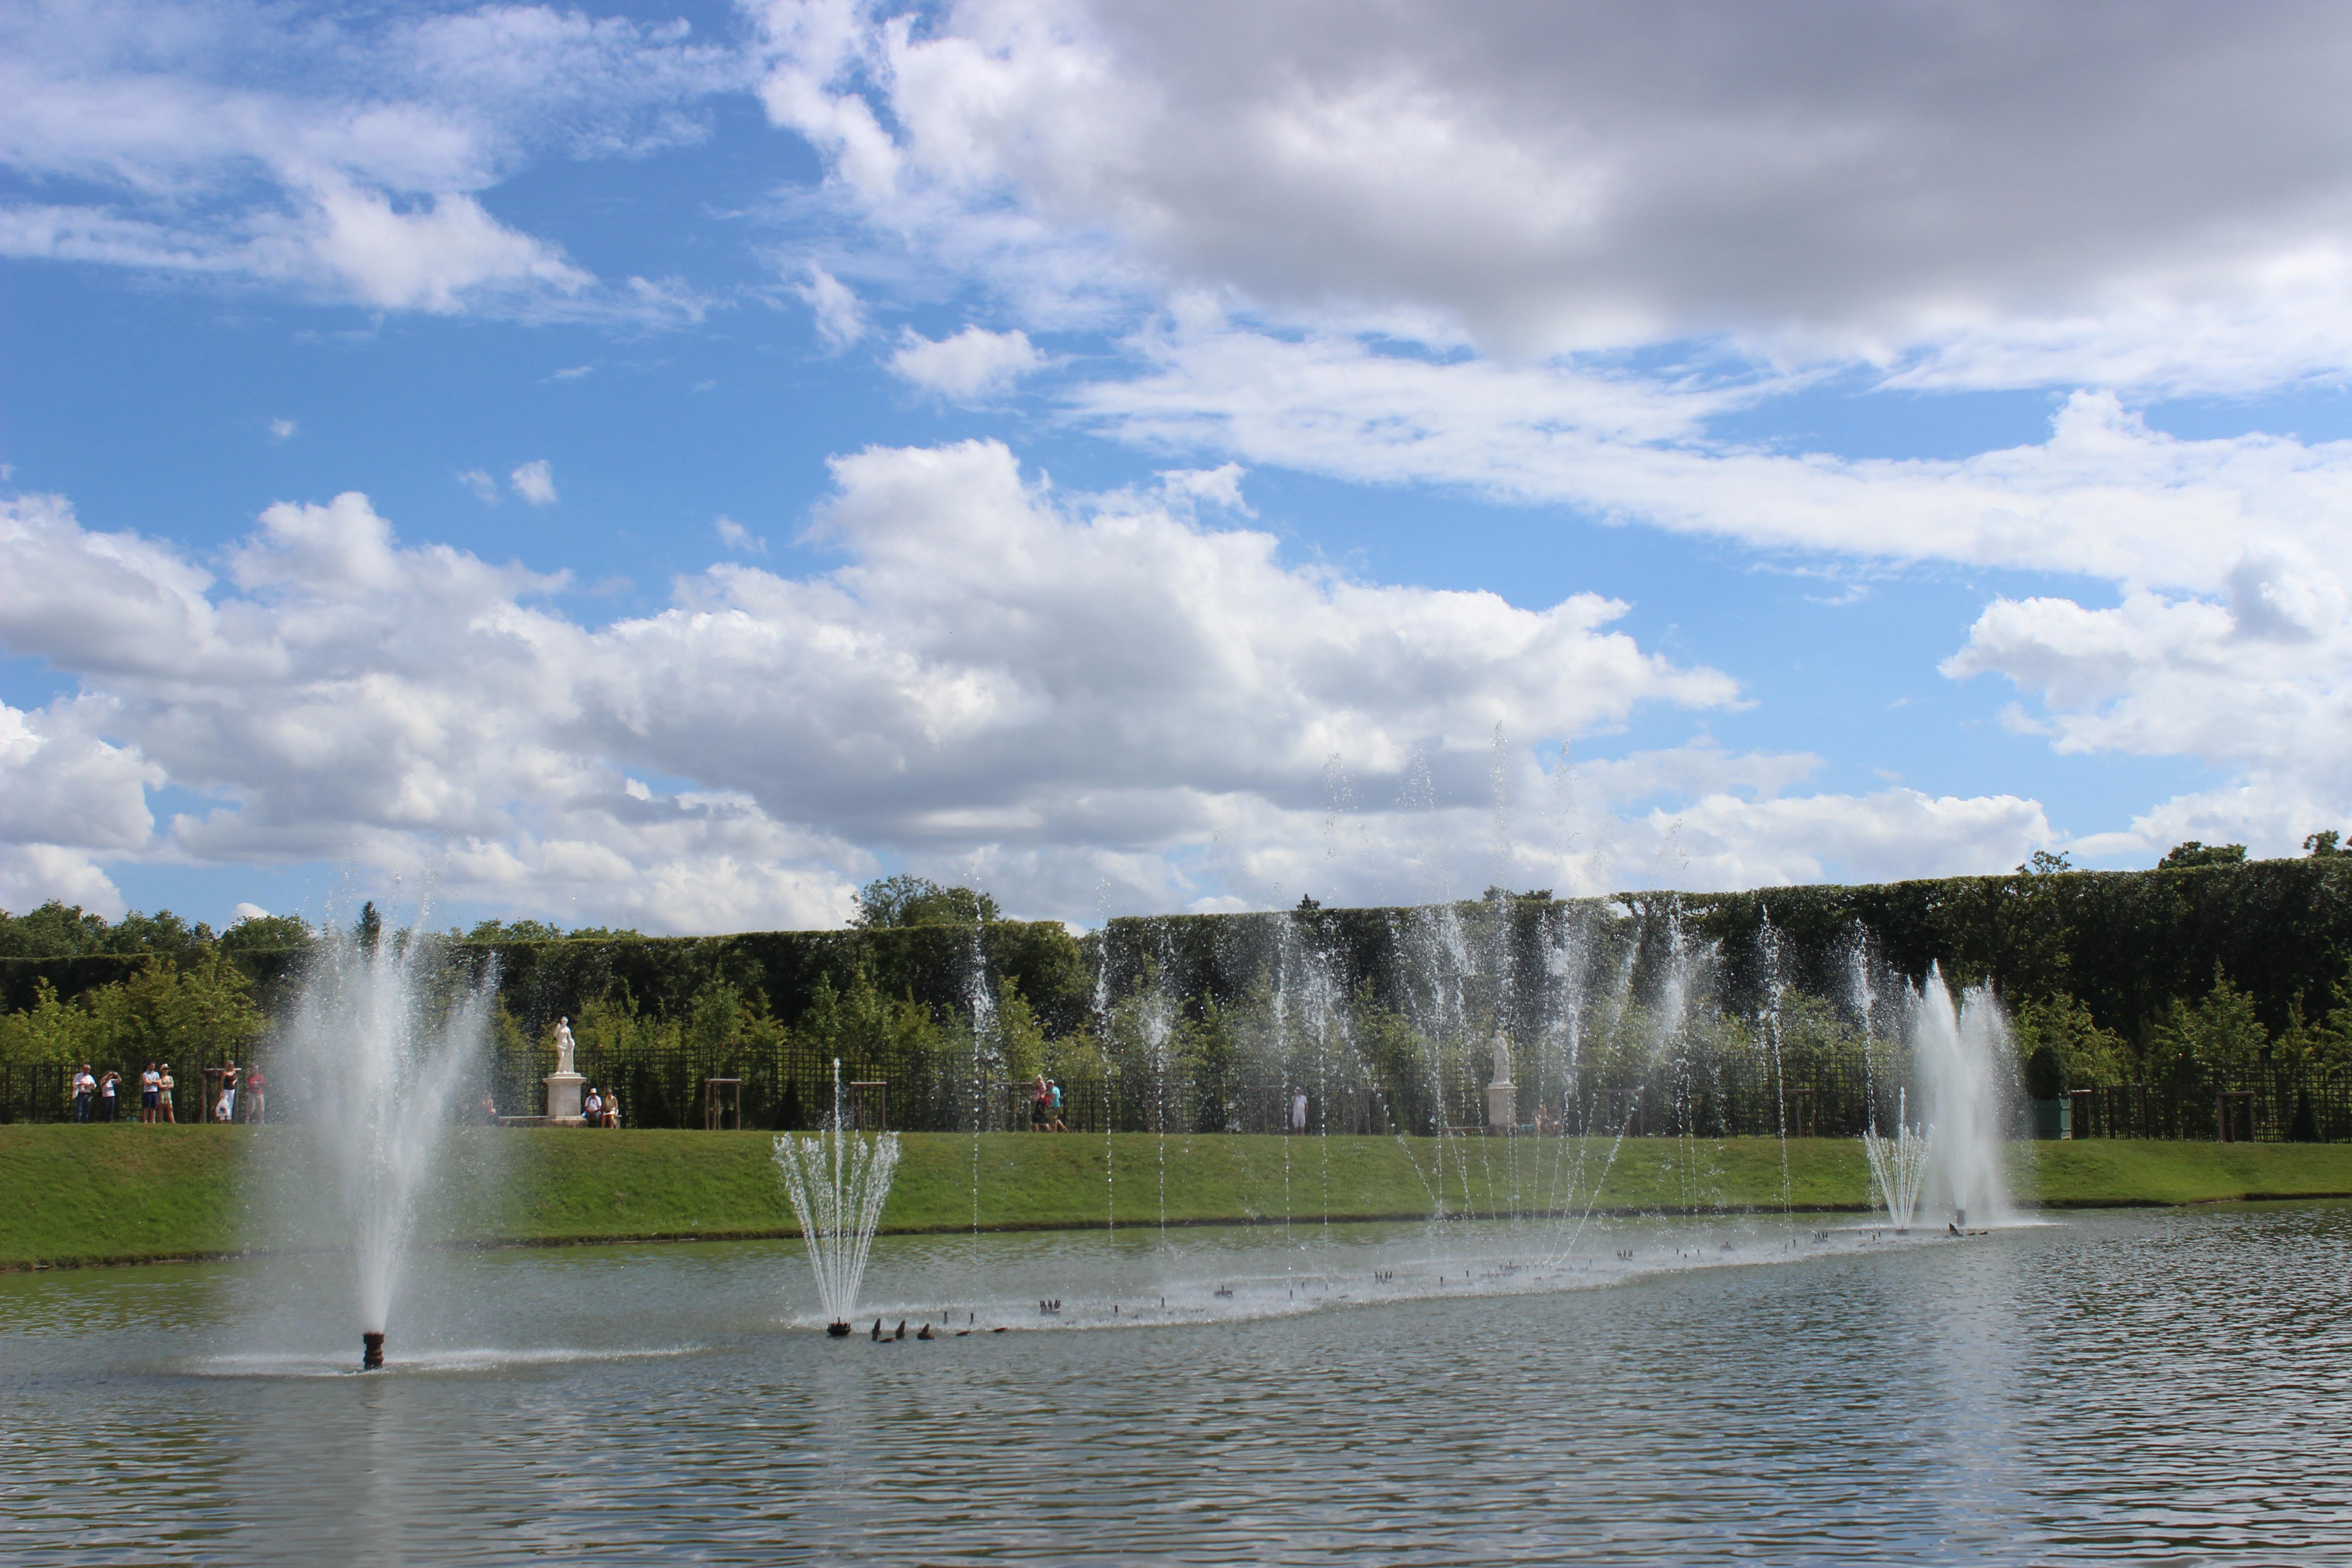 File bassin du miroir 2013 24 jpg wikimedia commons - Bassin effet miroir toulon ...